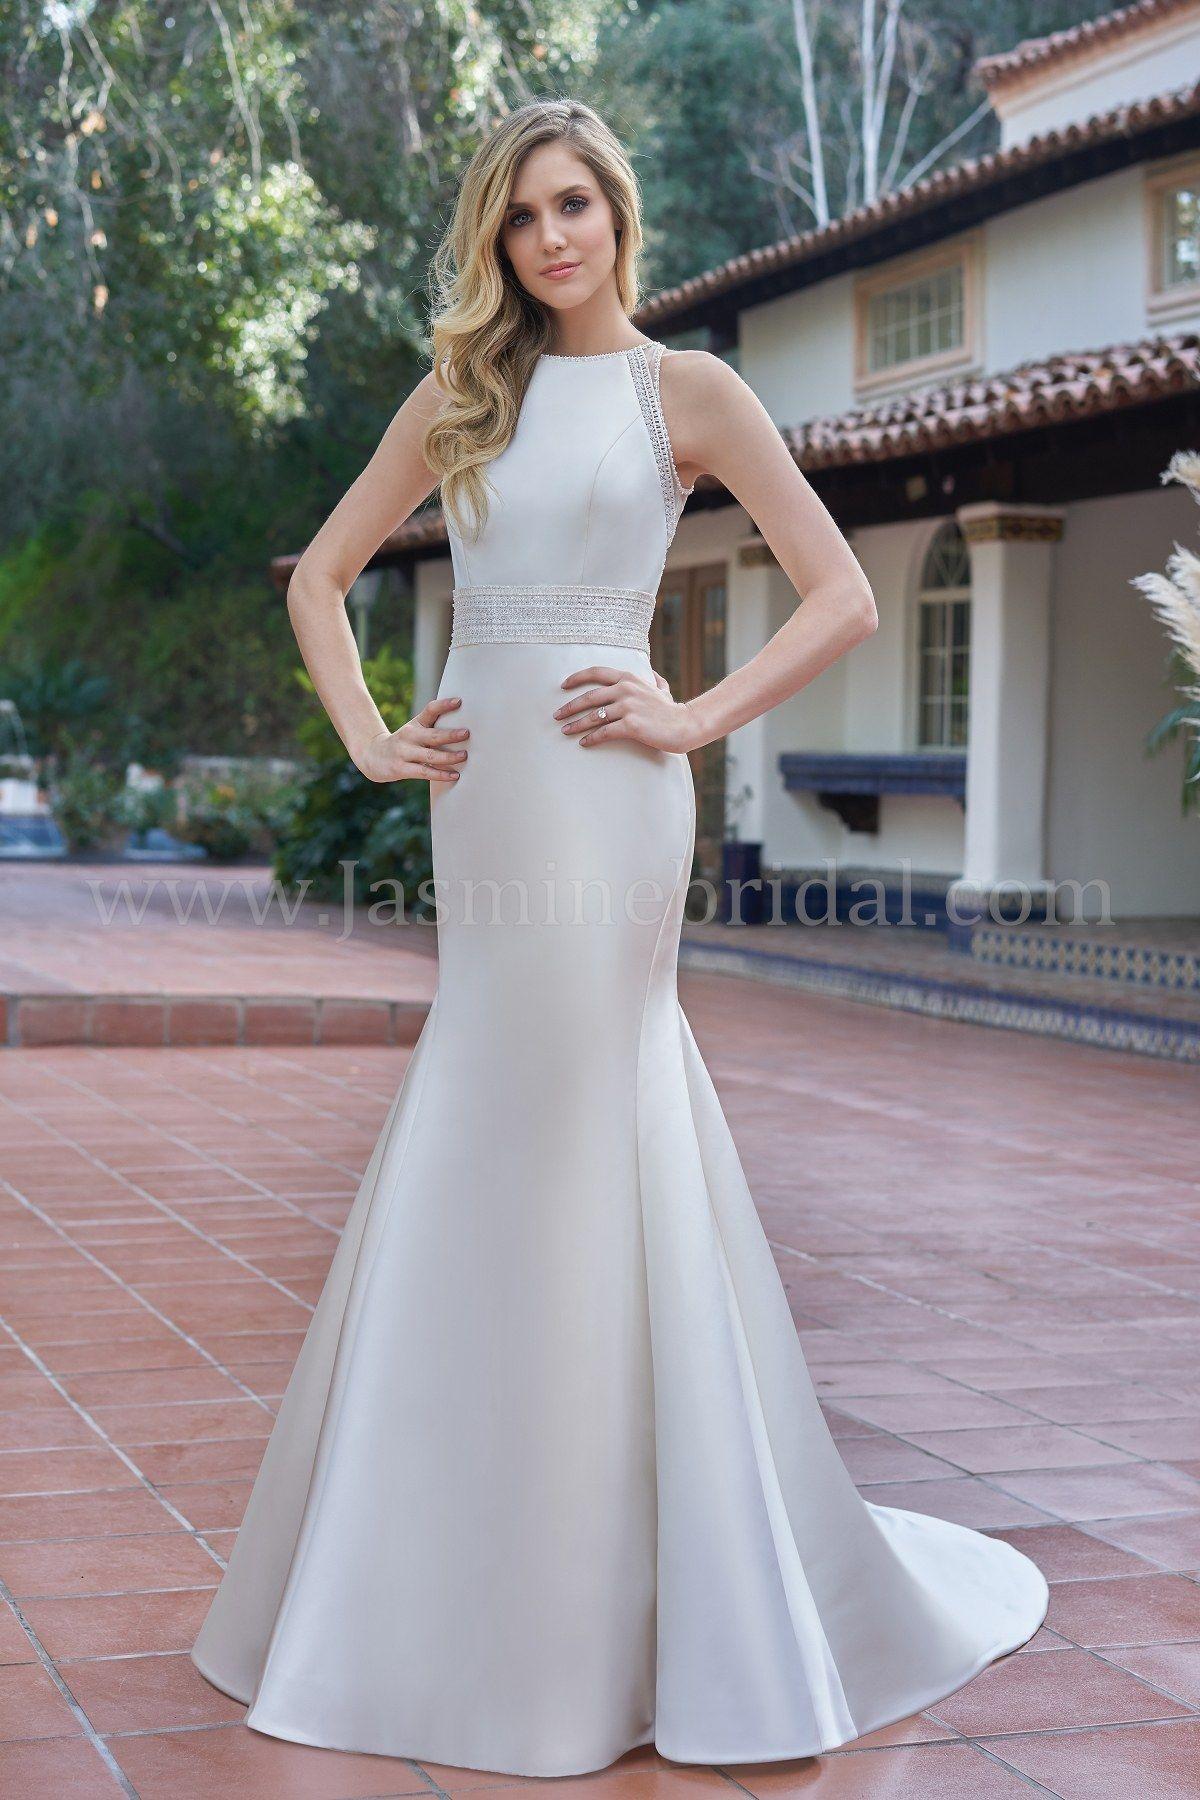 Jasmine wedding dresses  Jasmine Bridal Wedding Dress  Beautiful Wedding Dress  F